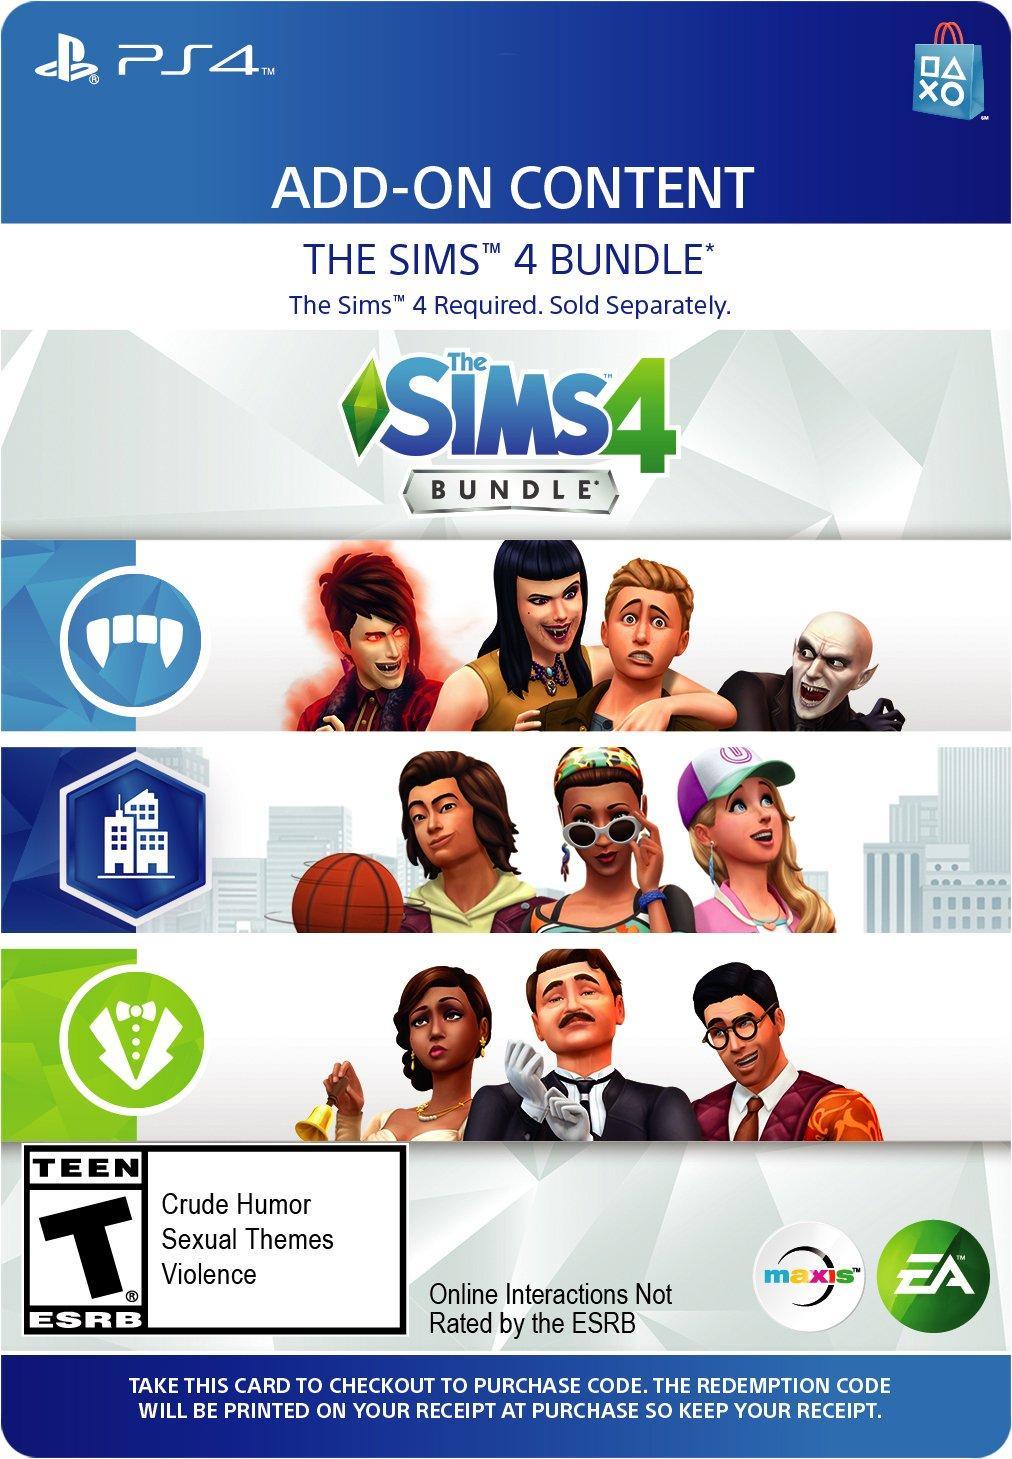 The Sims 4 DLC Bundle | PlayStation 4 | GameStop